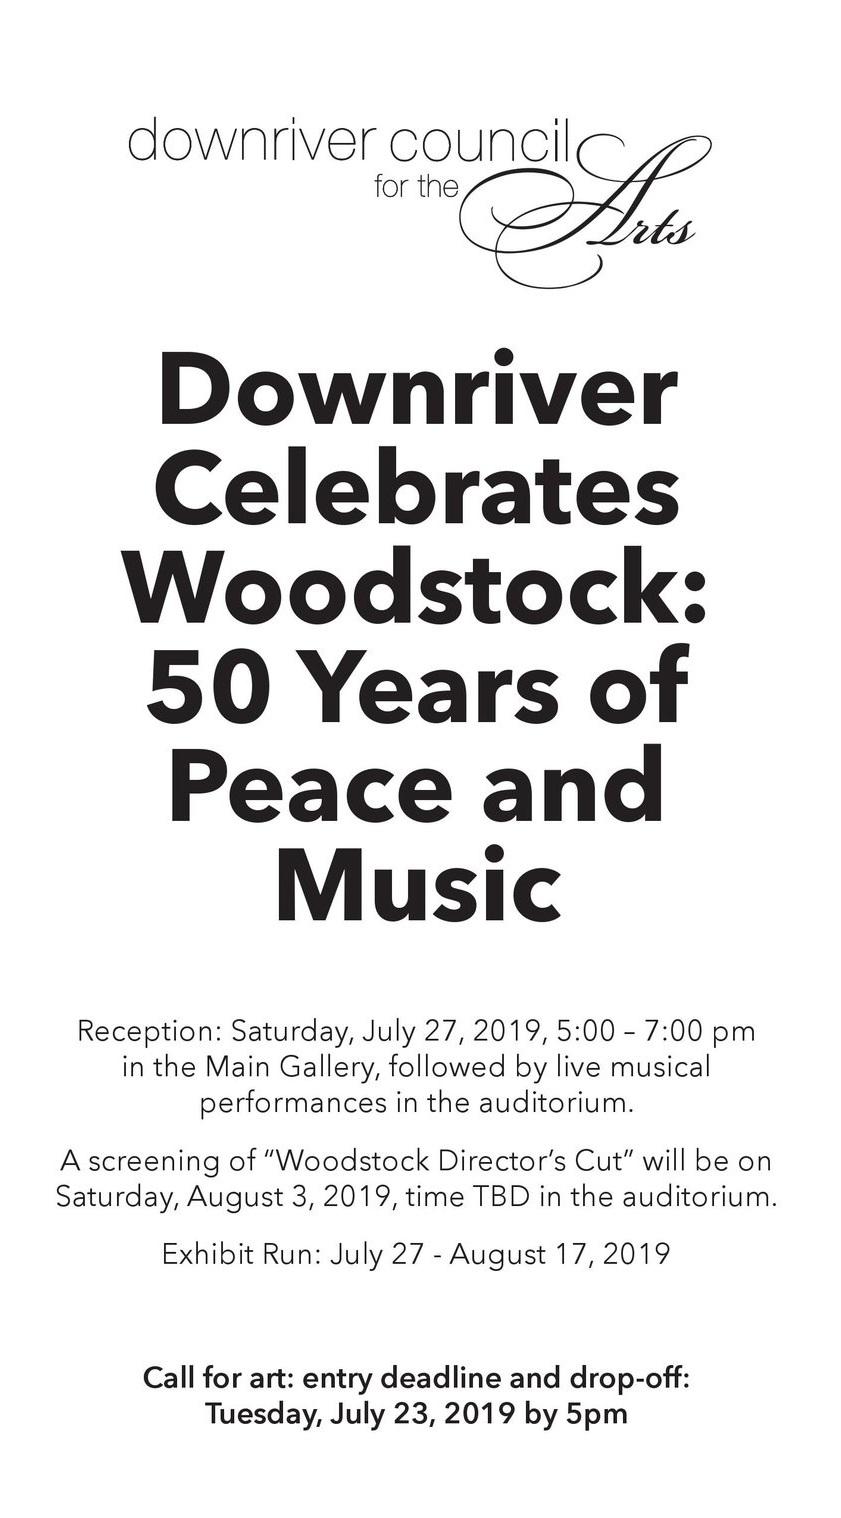 CFE-Woodstock2019-legal_00001.jpg